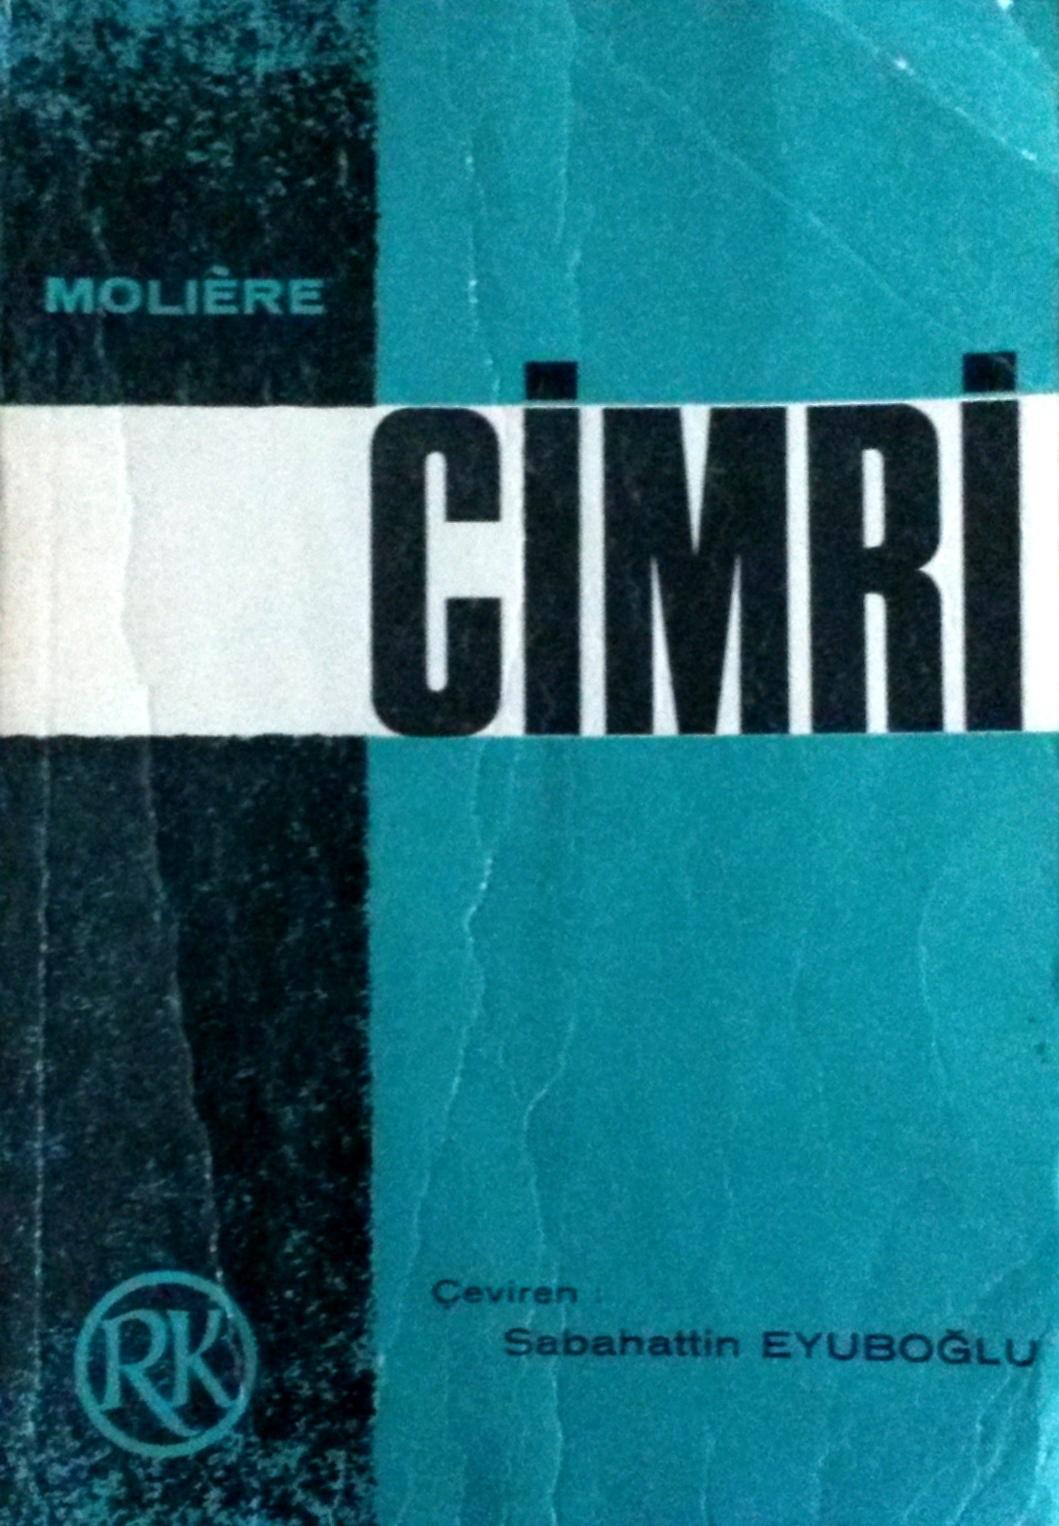 Cimri  by  Molière